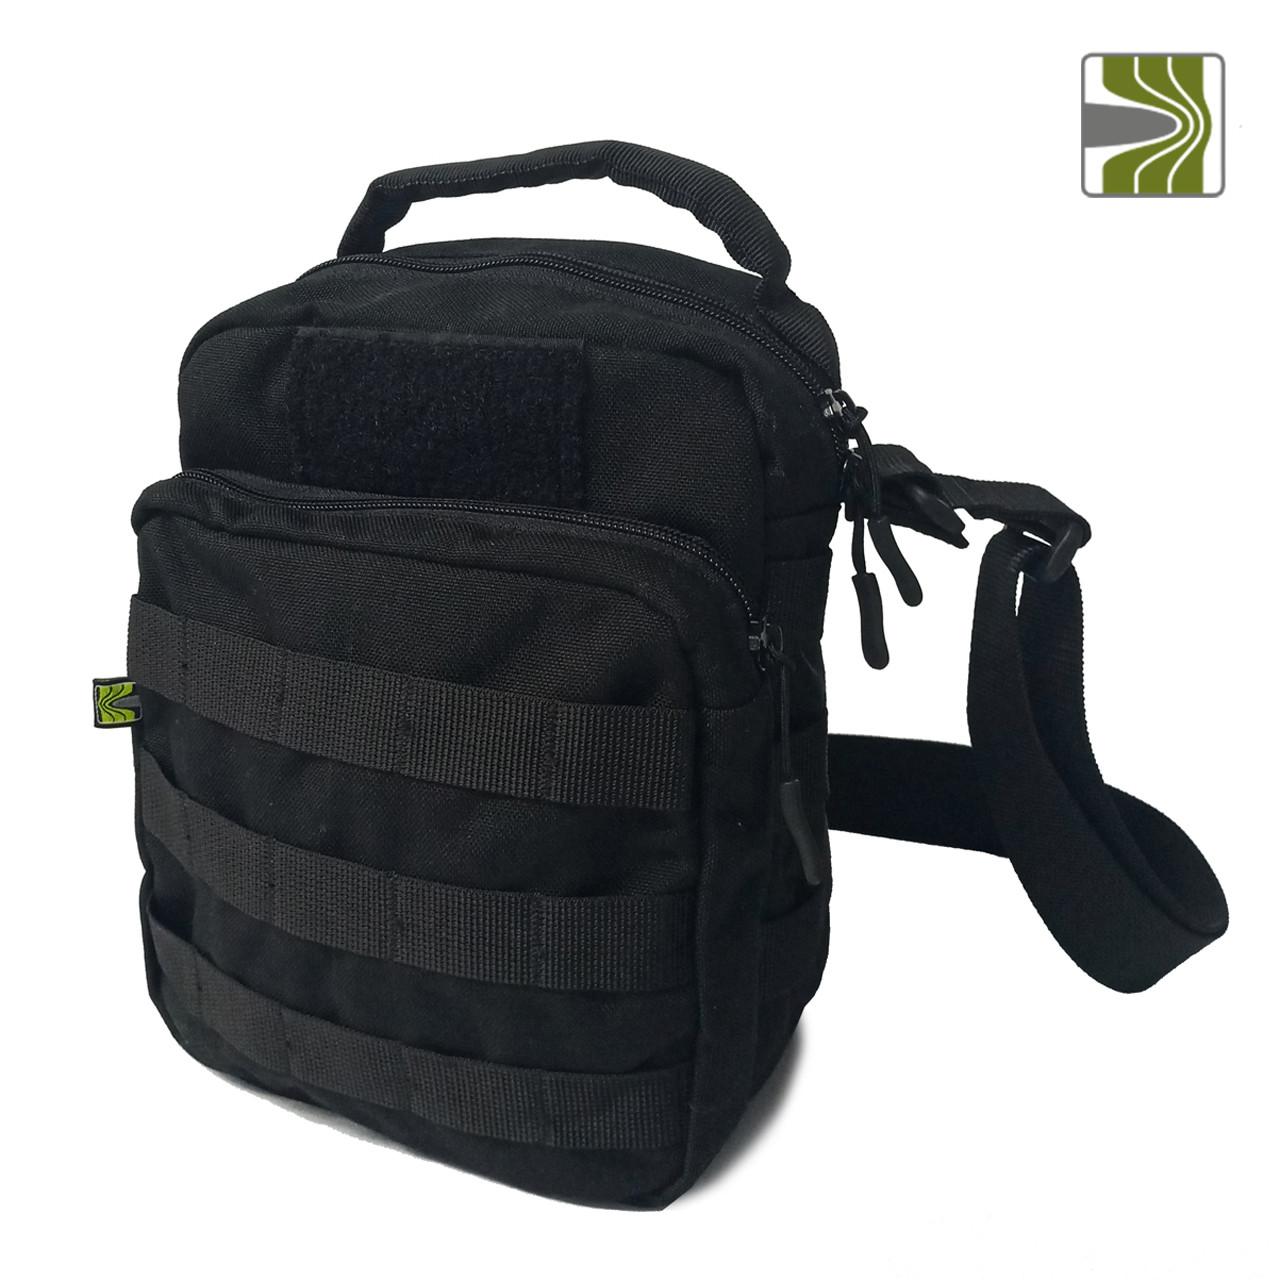 "Универсальная сумка-подсумок ТМ ""Балістика"", черная"